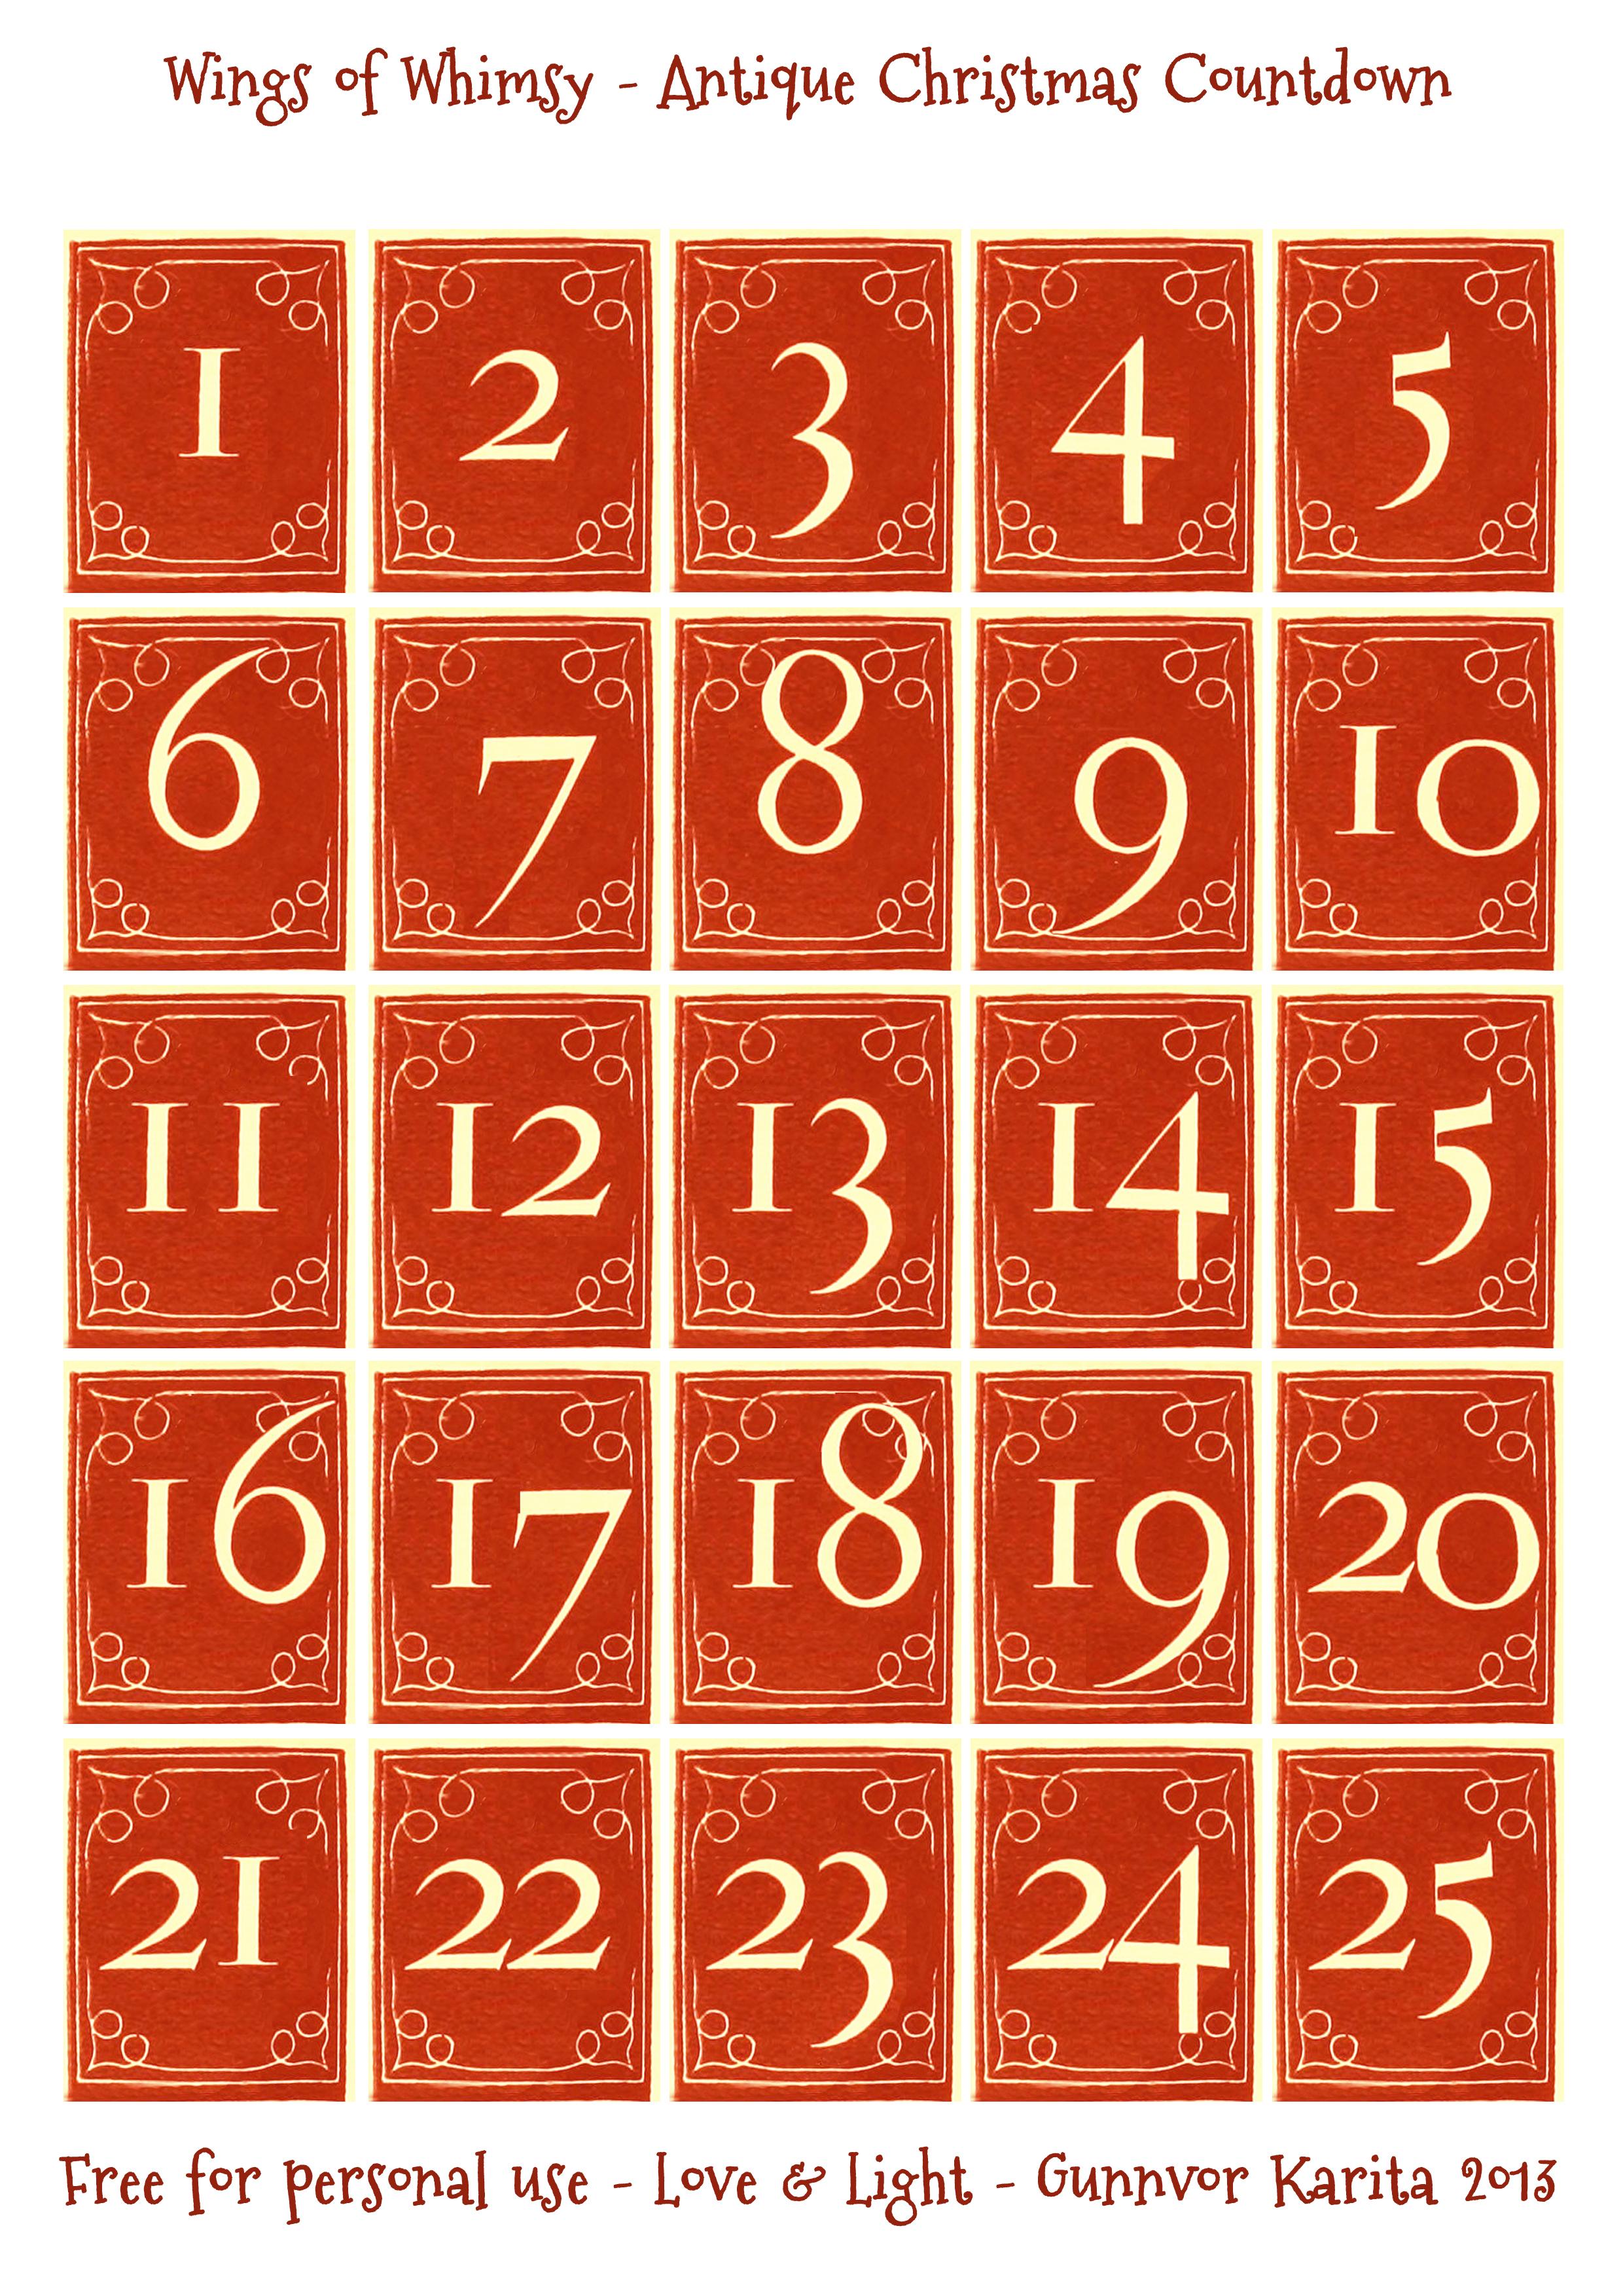 Vintage Christmas Village Day 2 3 4 Free Printables